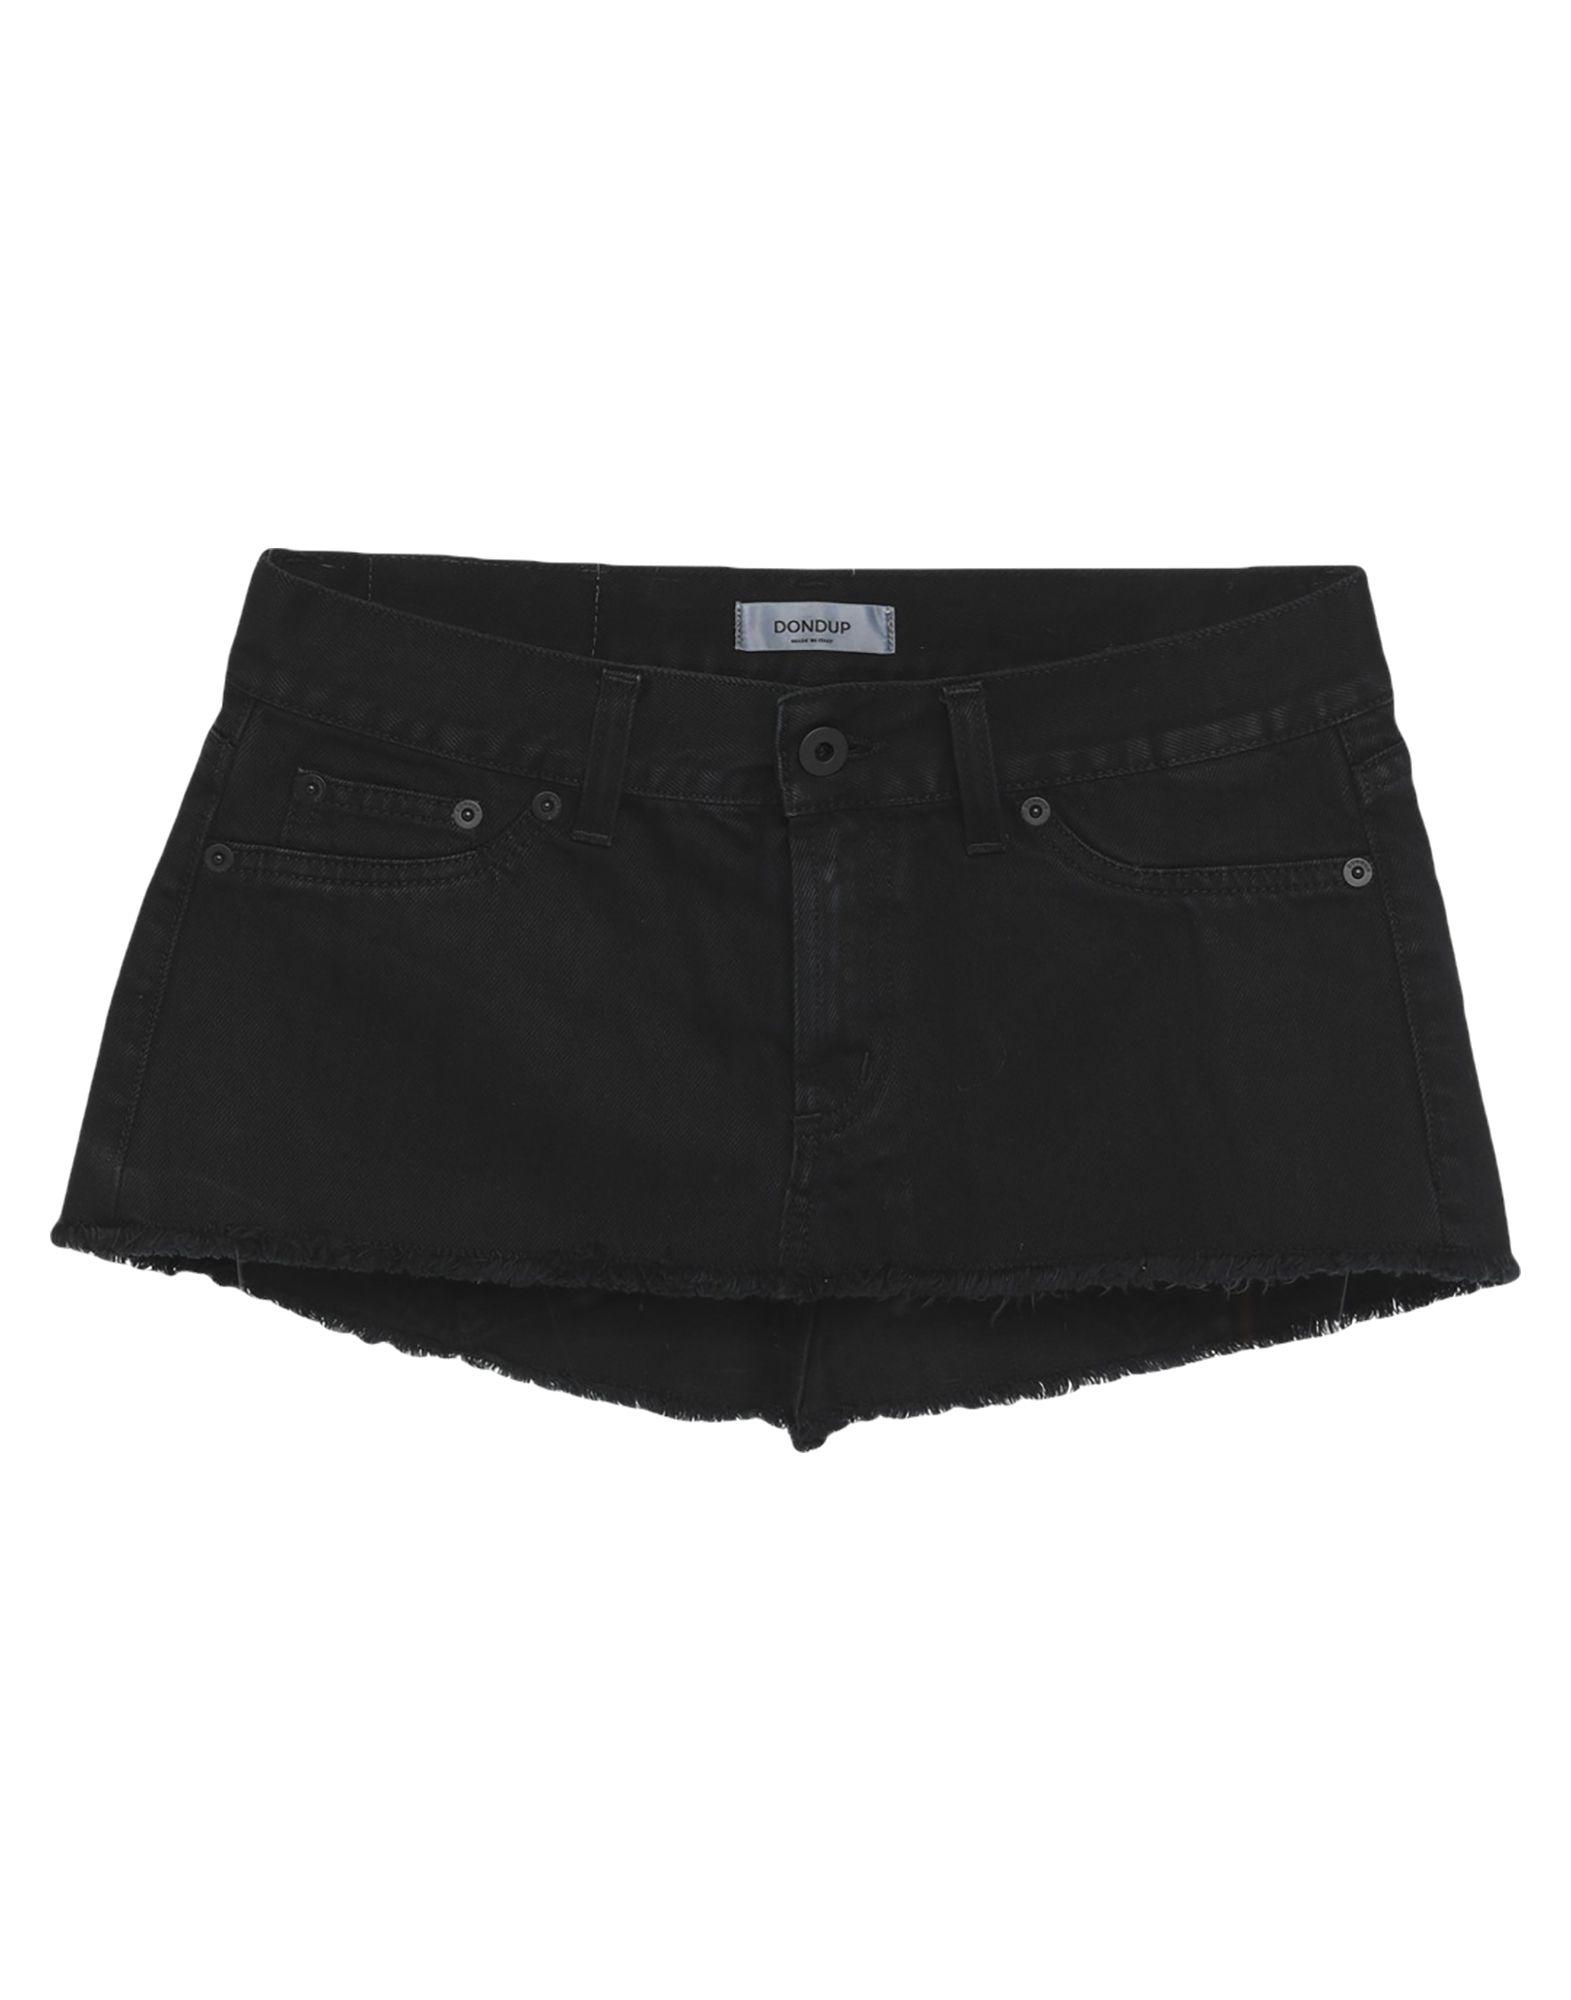 DONDUP Belts. denim, logo, basic solid color, wide, zipper closure, unlined, external pockets. 100% Cotton